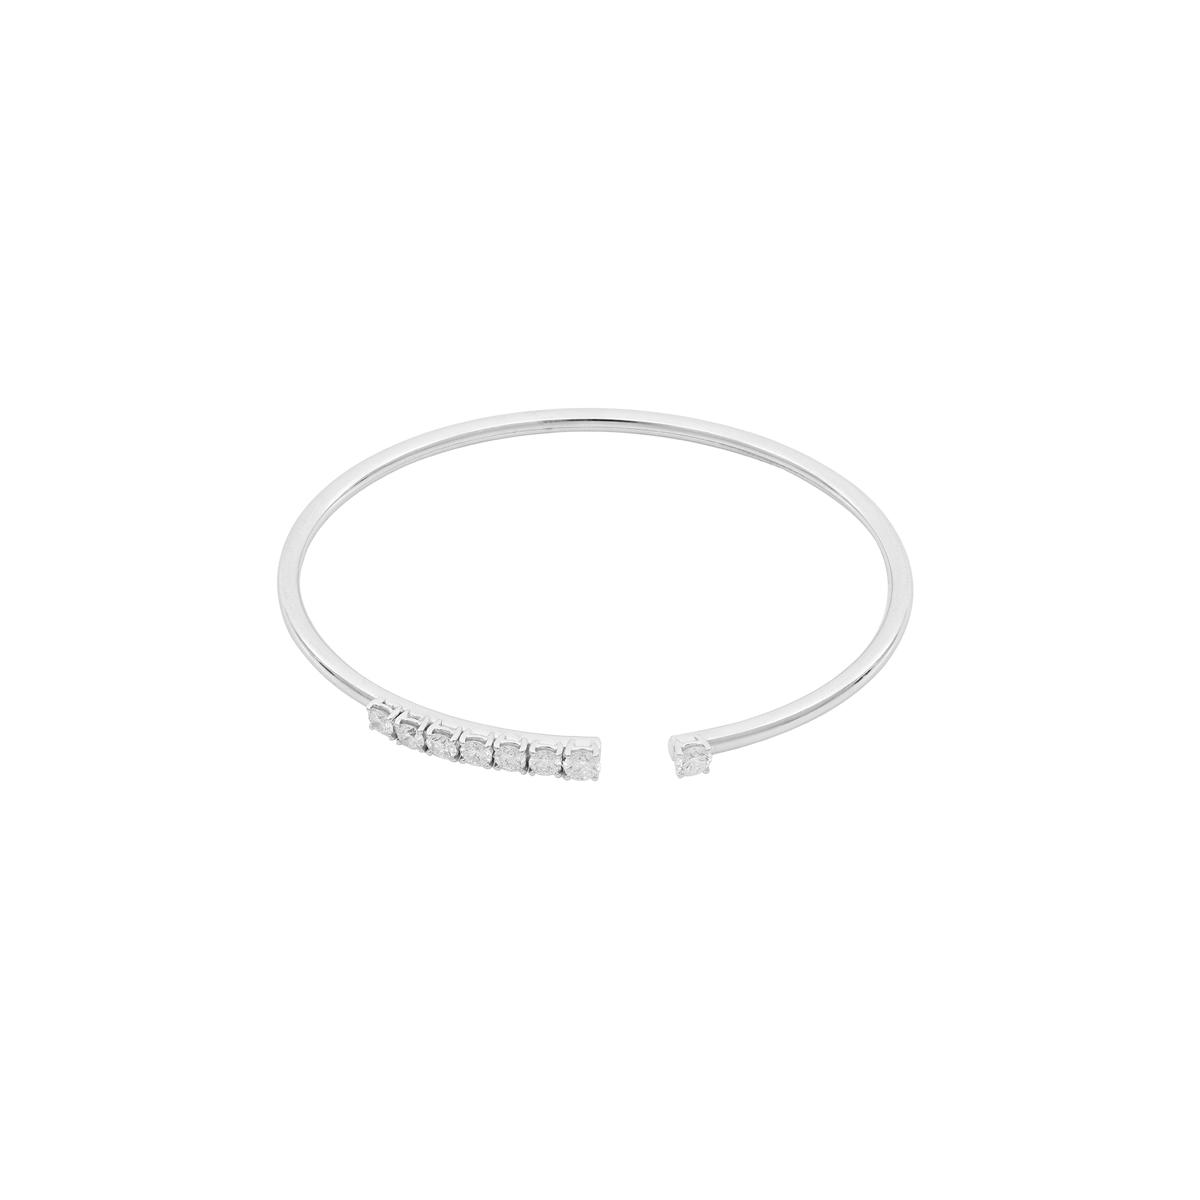 Fine White Gold Diamond Open-Cuff Bangle Bracelet